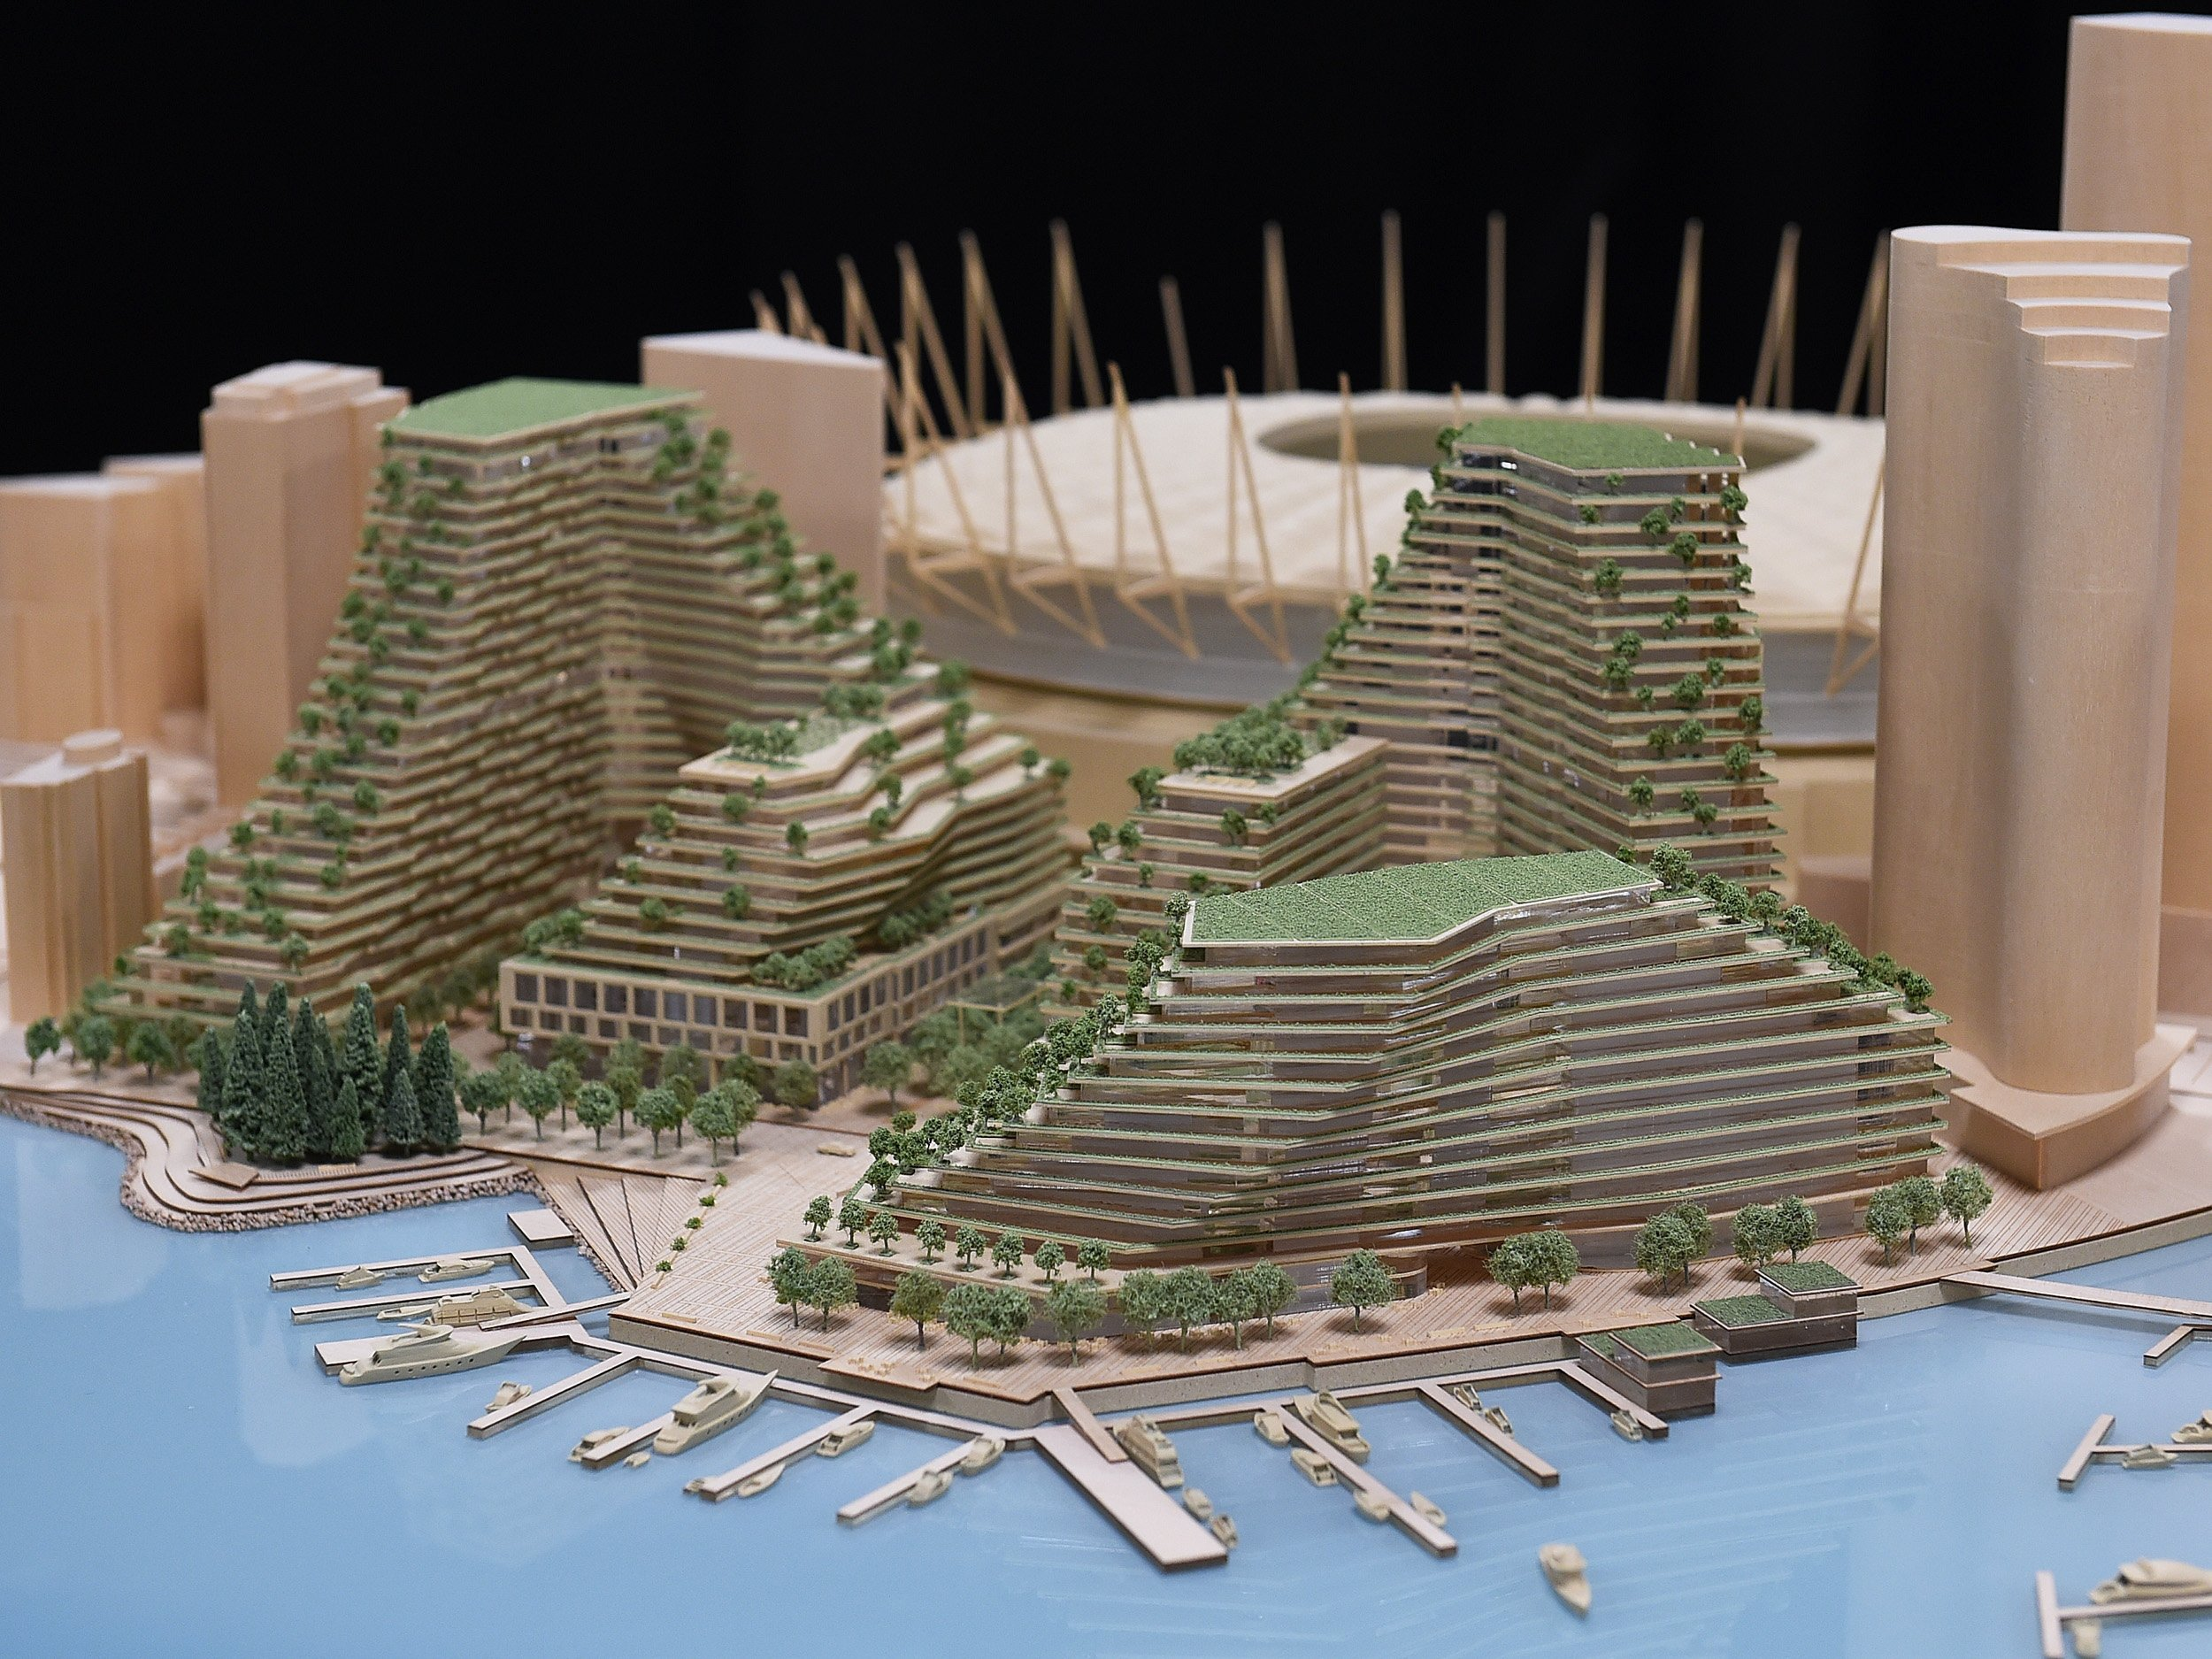 A model of the planned development. Photo Dan Toulgoet!